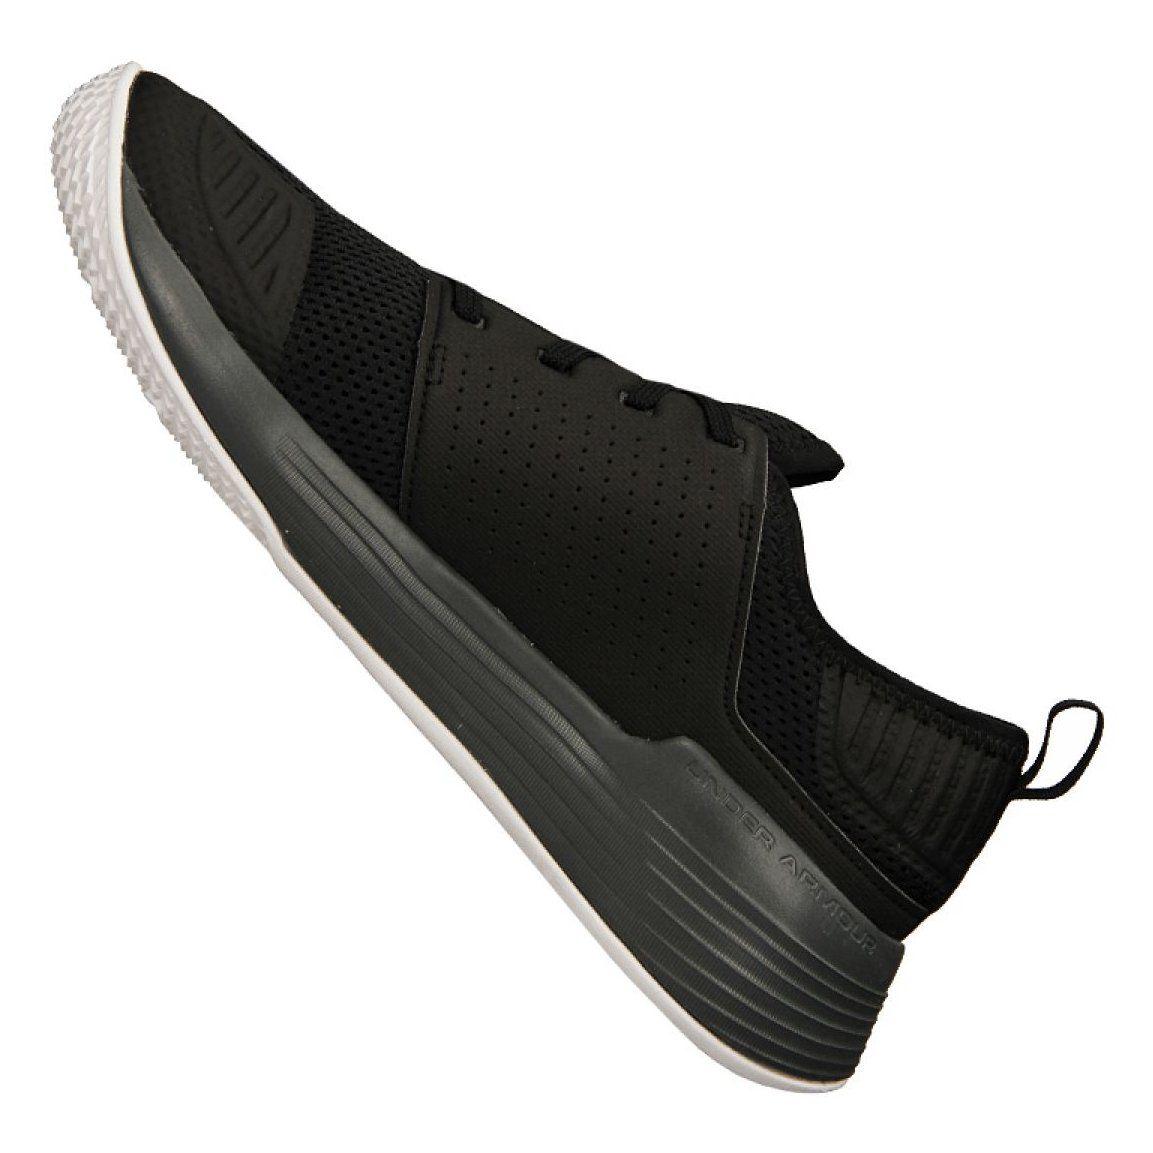 Givova Buty Treningowe Under Armour Showstopper 2 0 M 3020542 005 Czarne Black Shoes Training Shoes Shoes